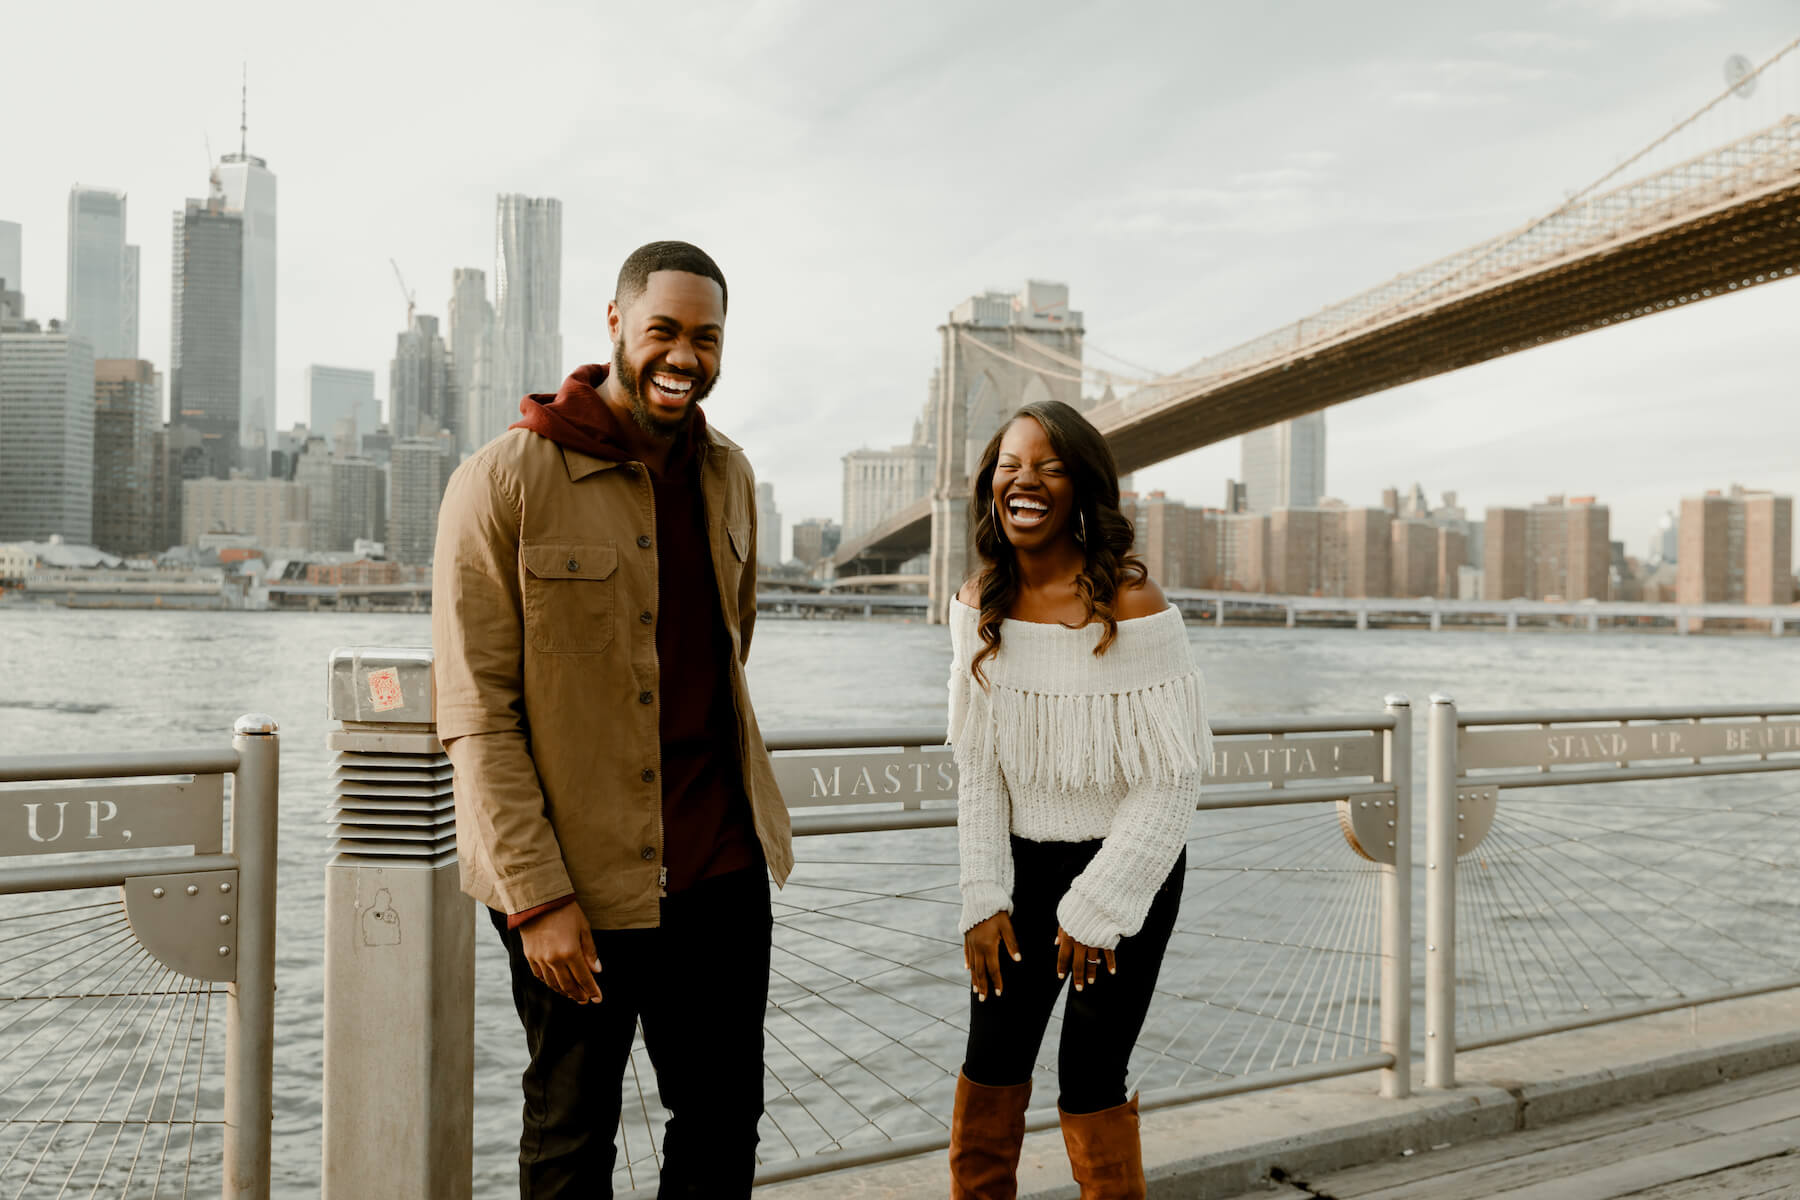 new-york-city-11-21-2019-just-because-4_original